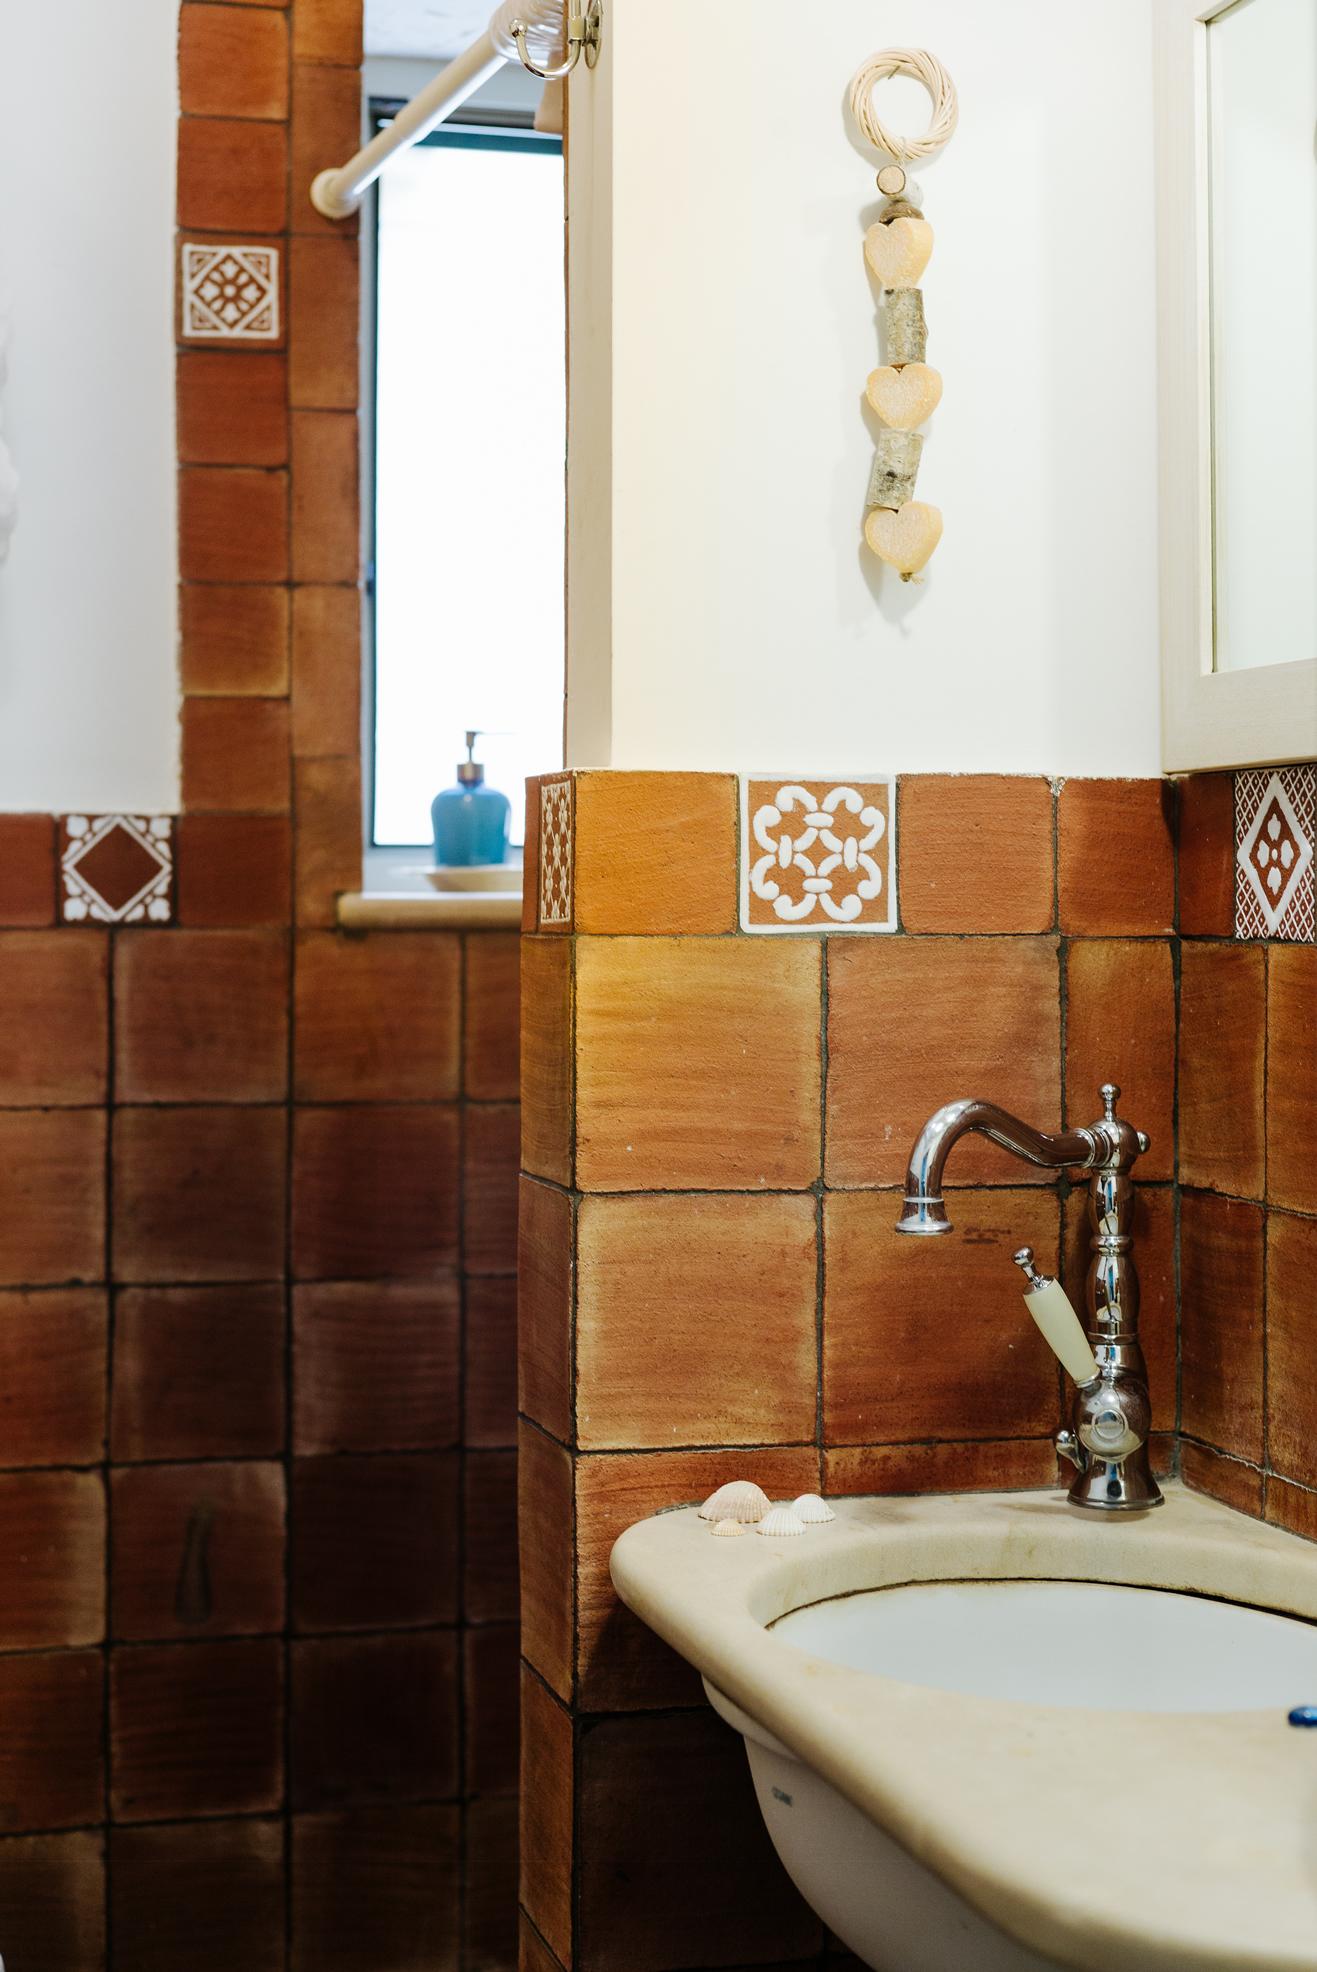 13sampieri-casa-vacanze-sicilia-appartamento-sicily-holiday-apartment-casa-del-pescatore-italia-italy.jpg